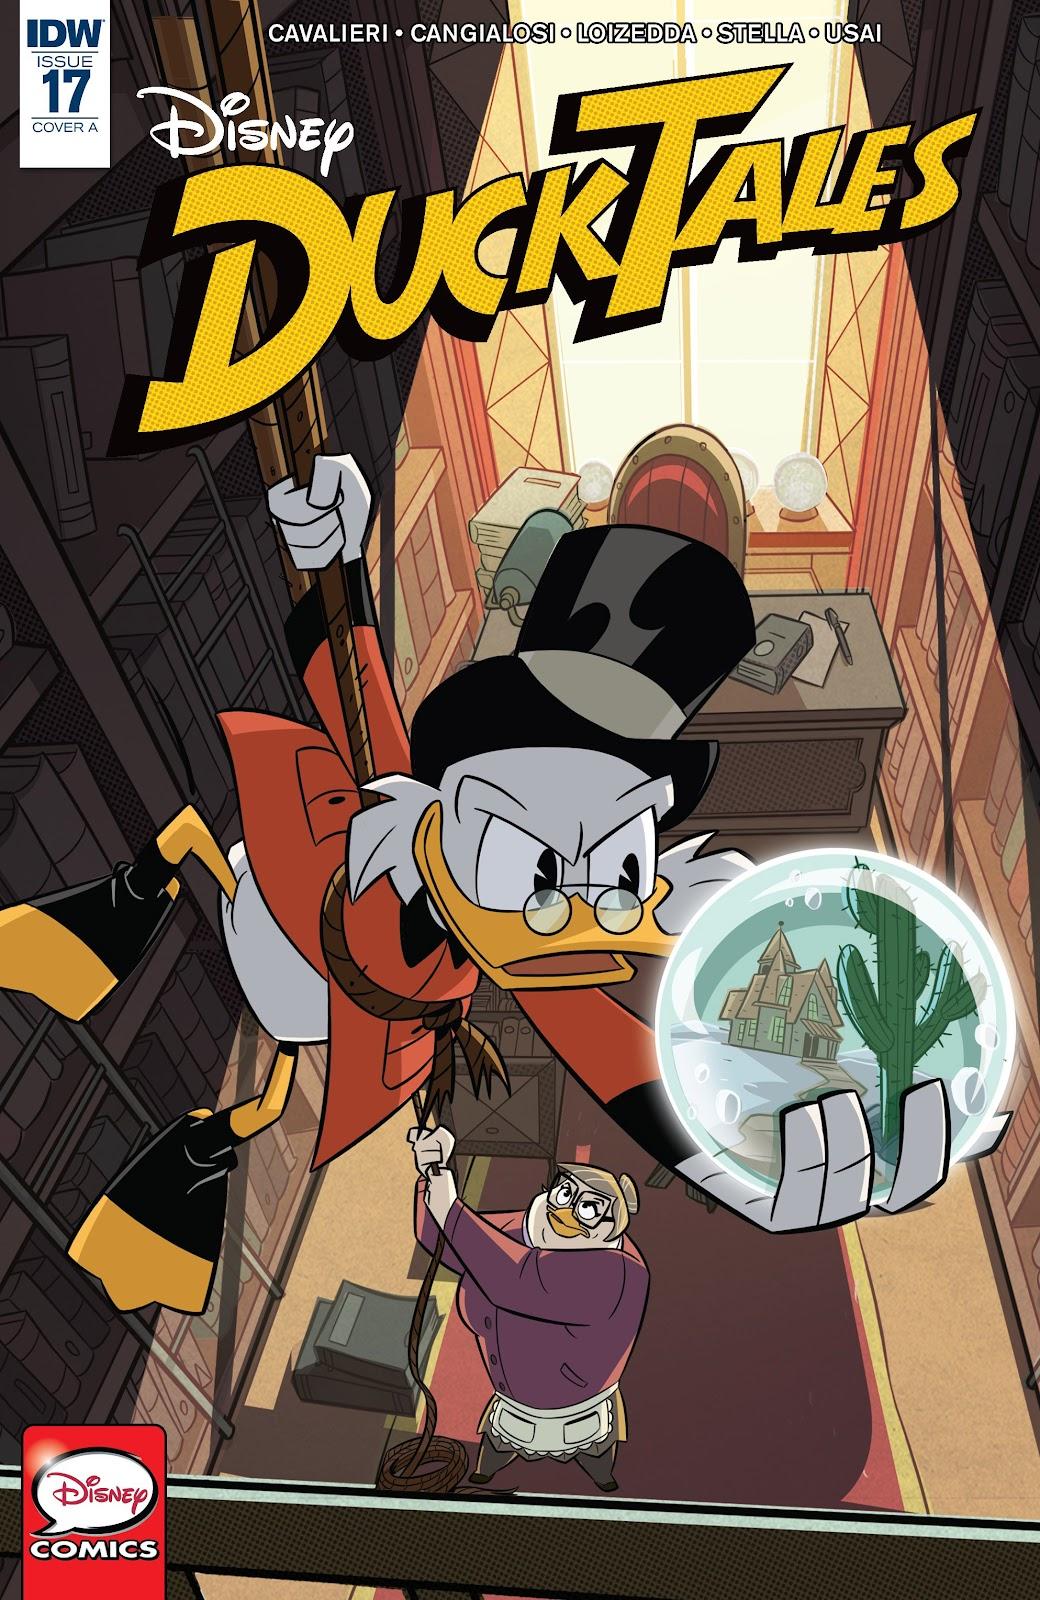 Read online Ducktales (2017) comic -  Issue #17 - 1